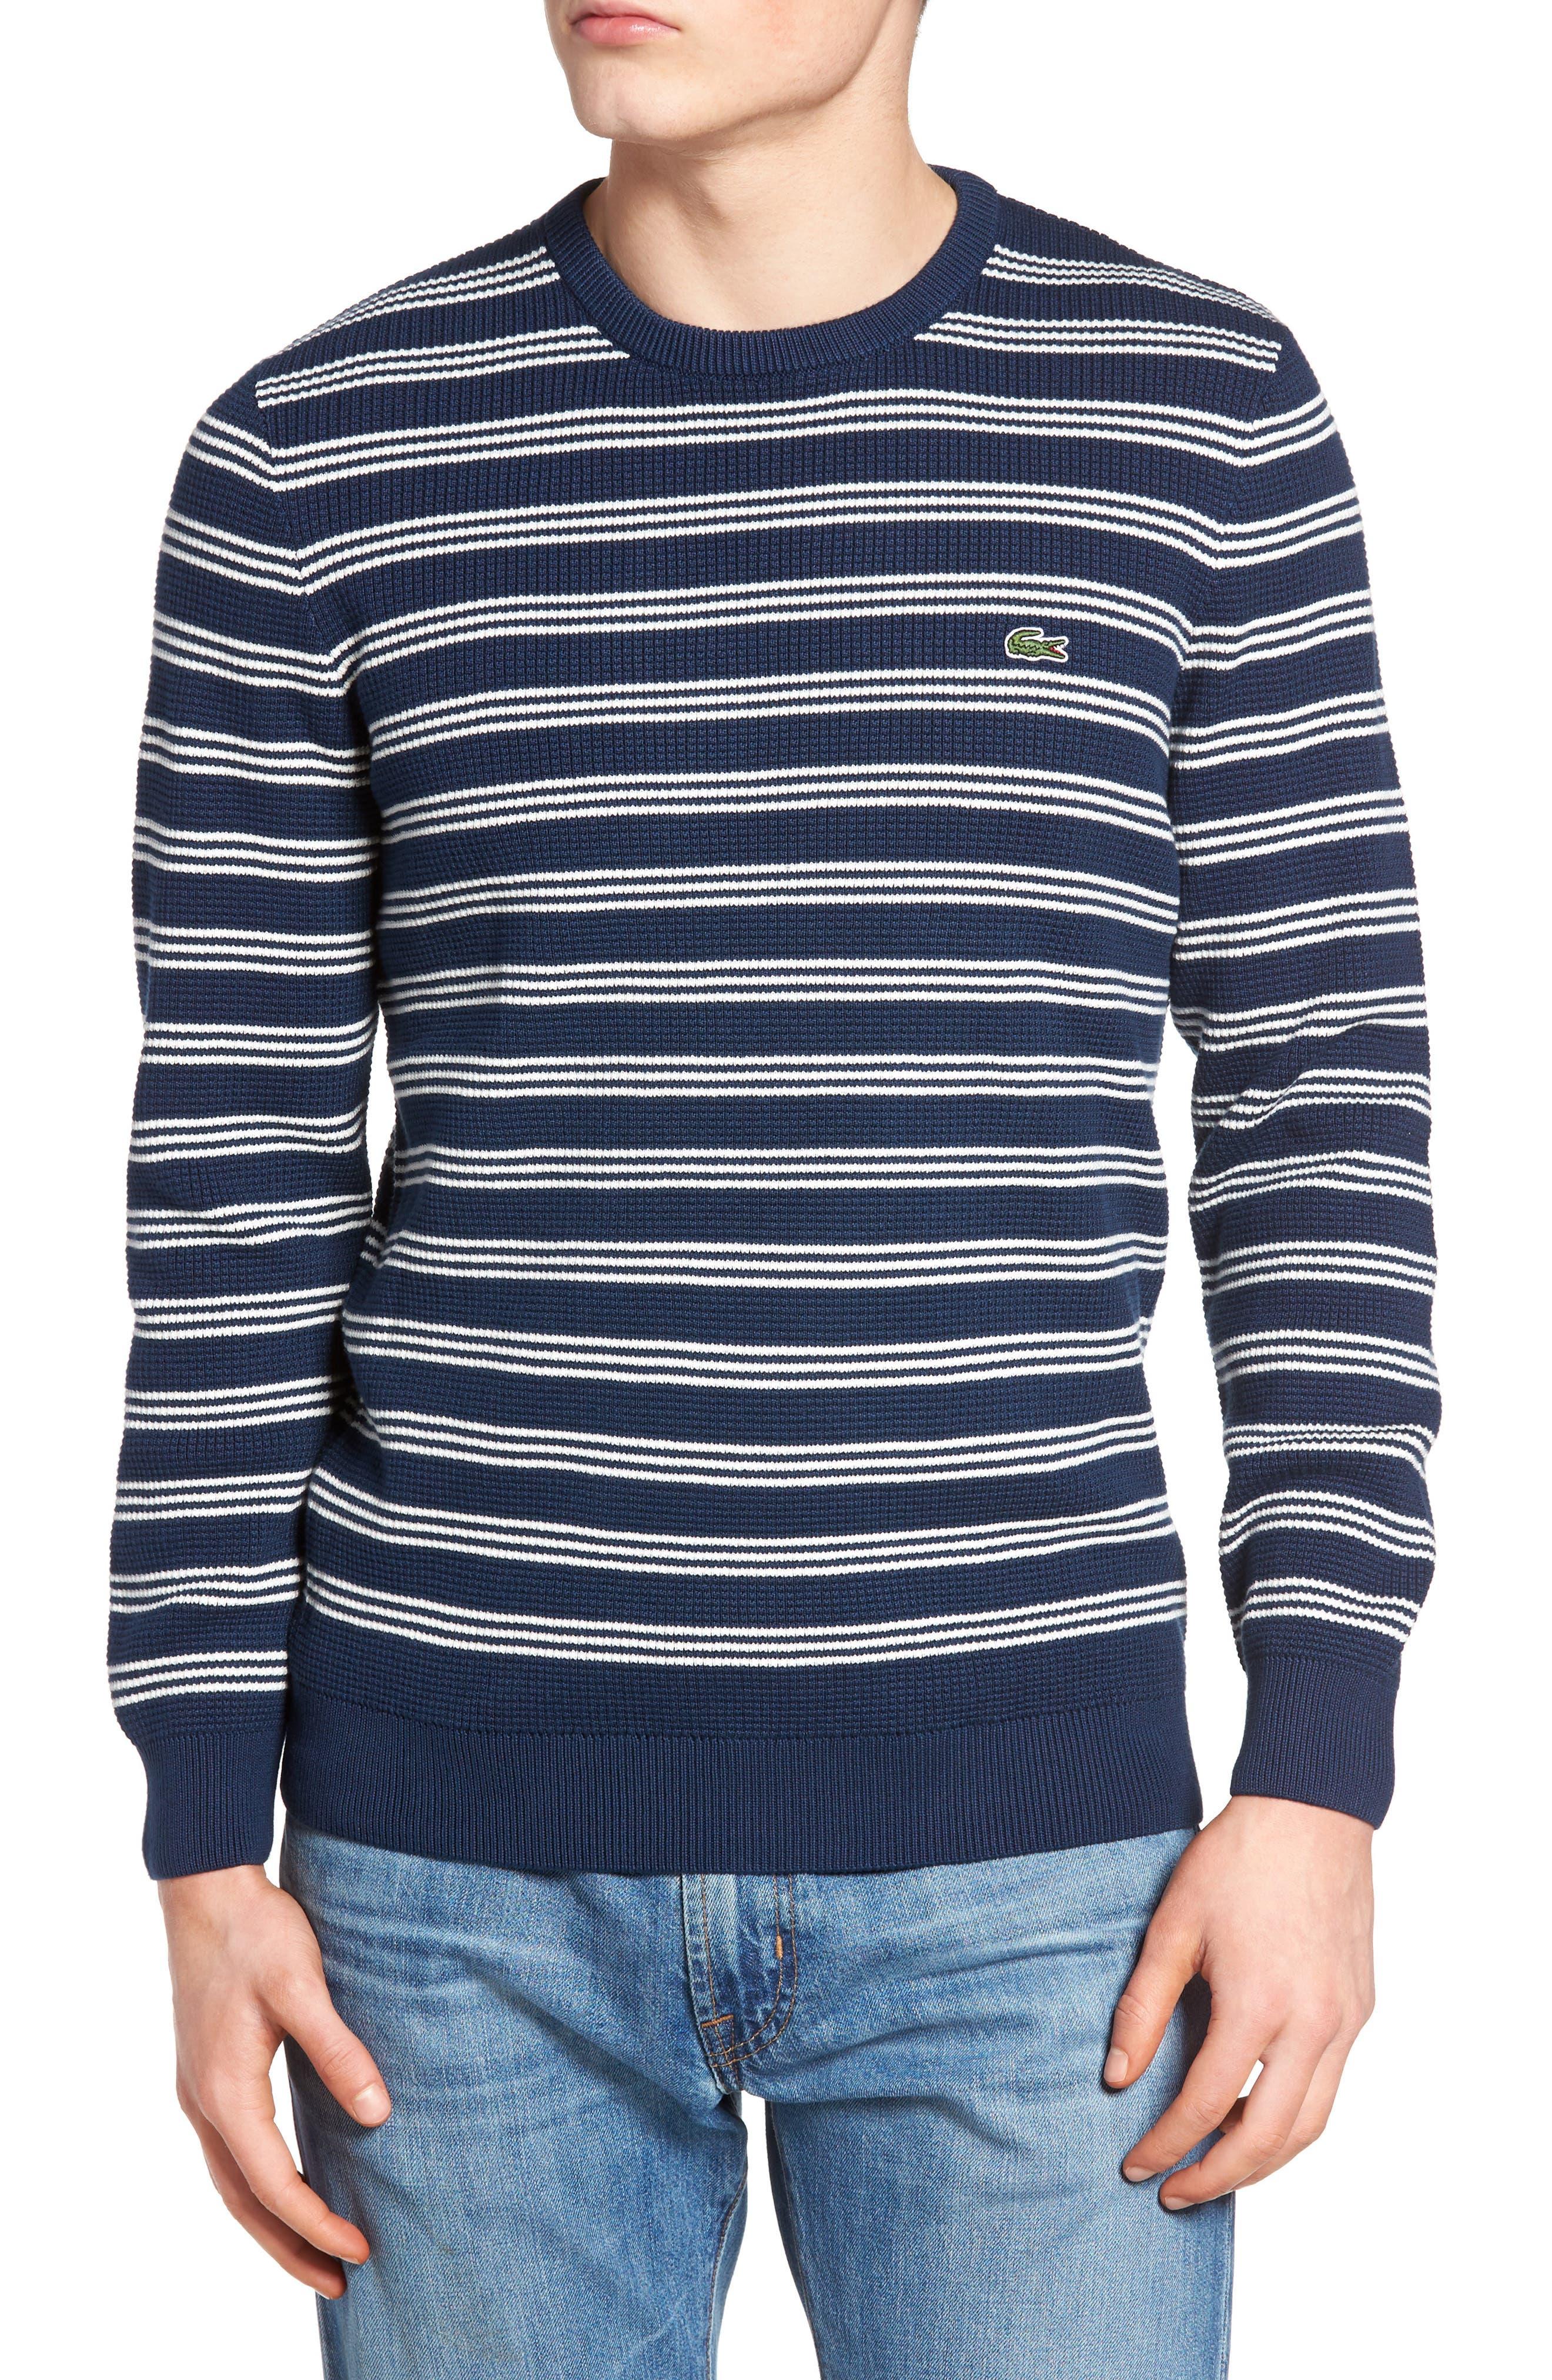 Alternate Image 1 Selected - Lacoste Waffle Stitch Stripe Sweater